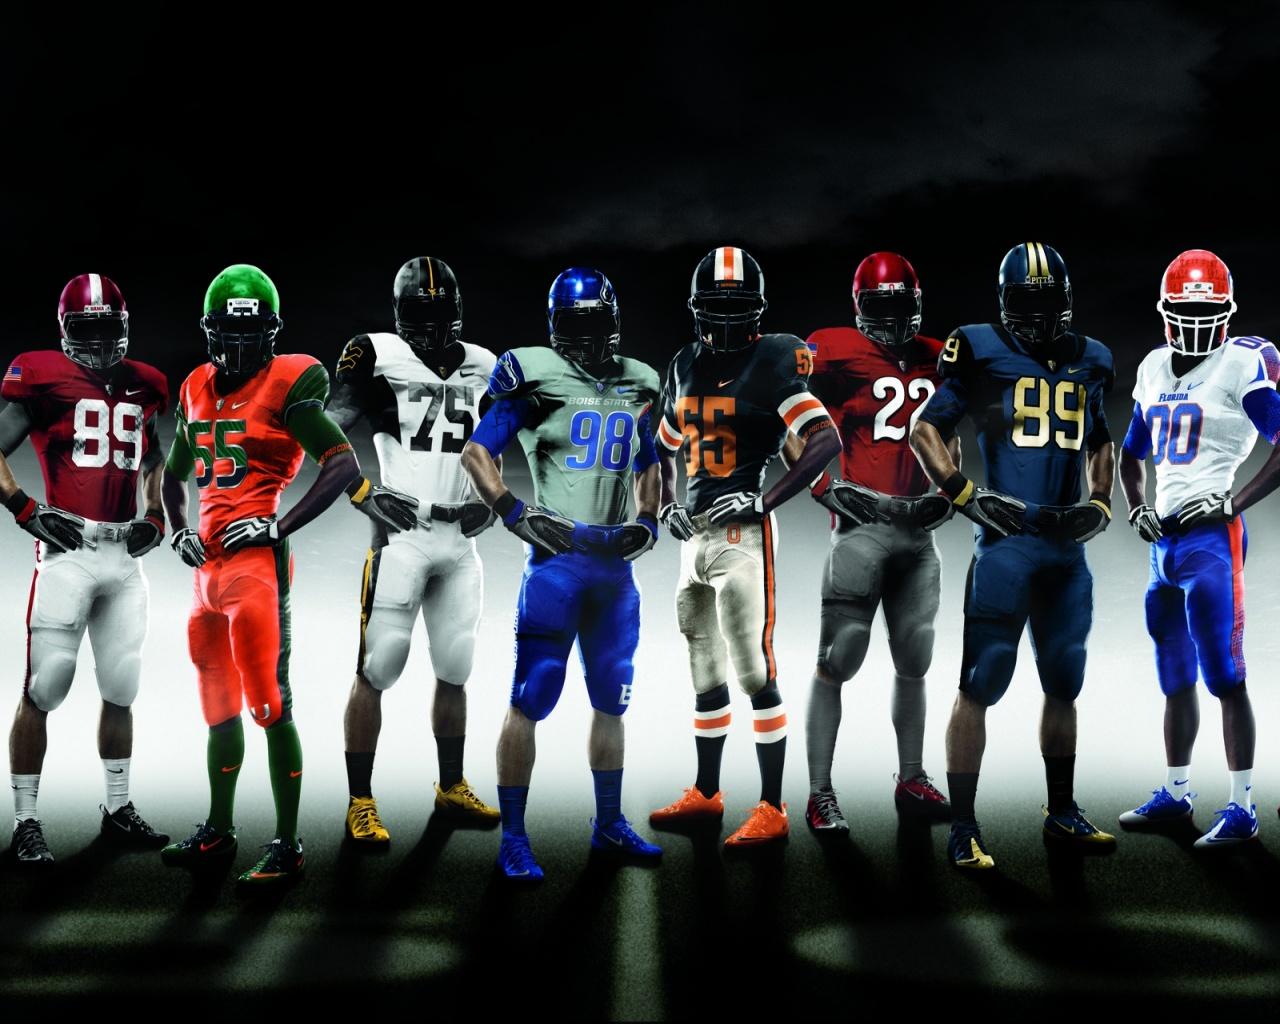 Nike American Football Team   1280x1024   363004 1280x1024